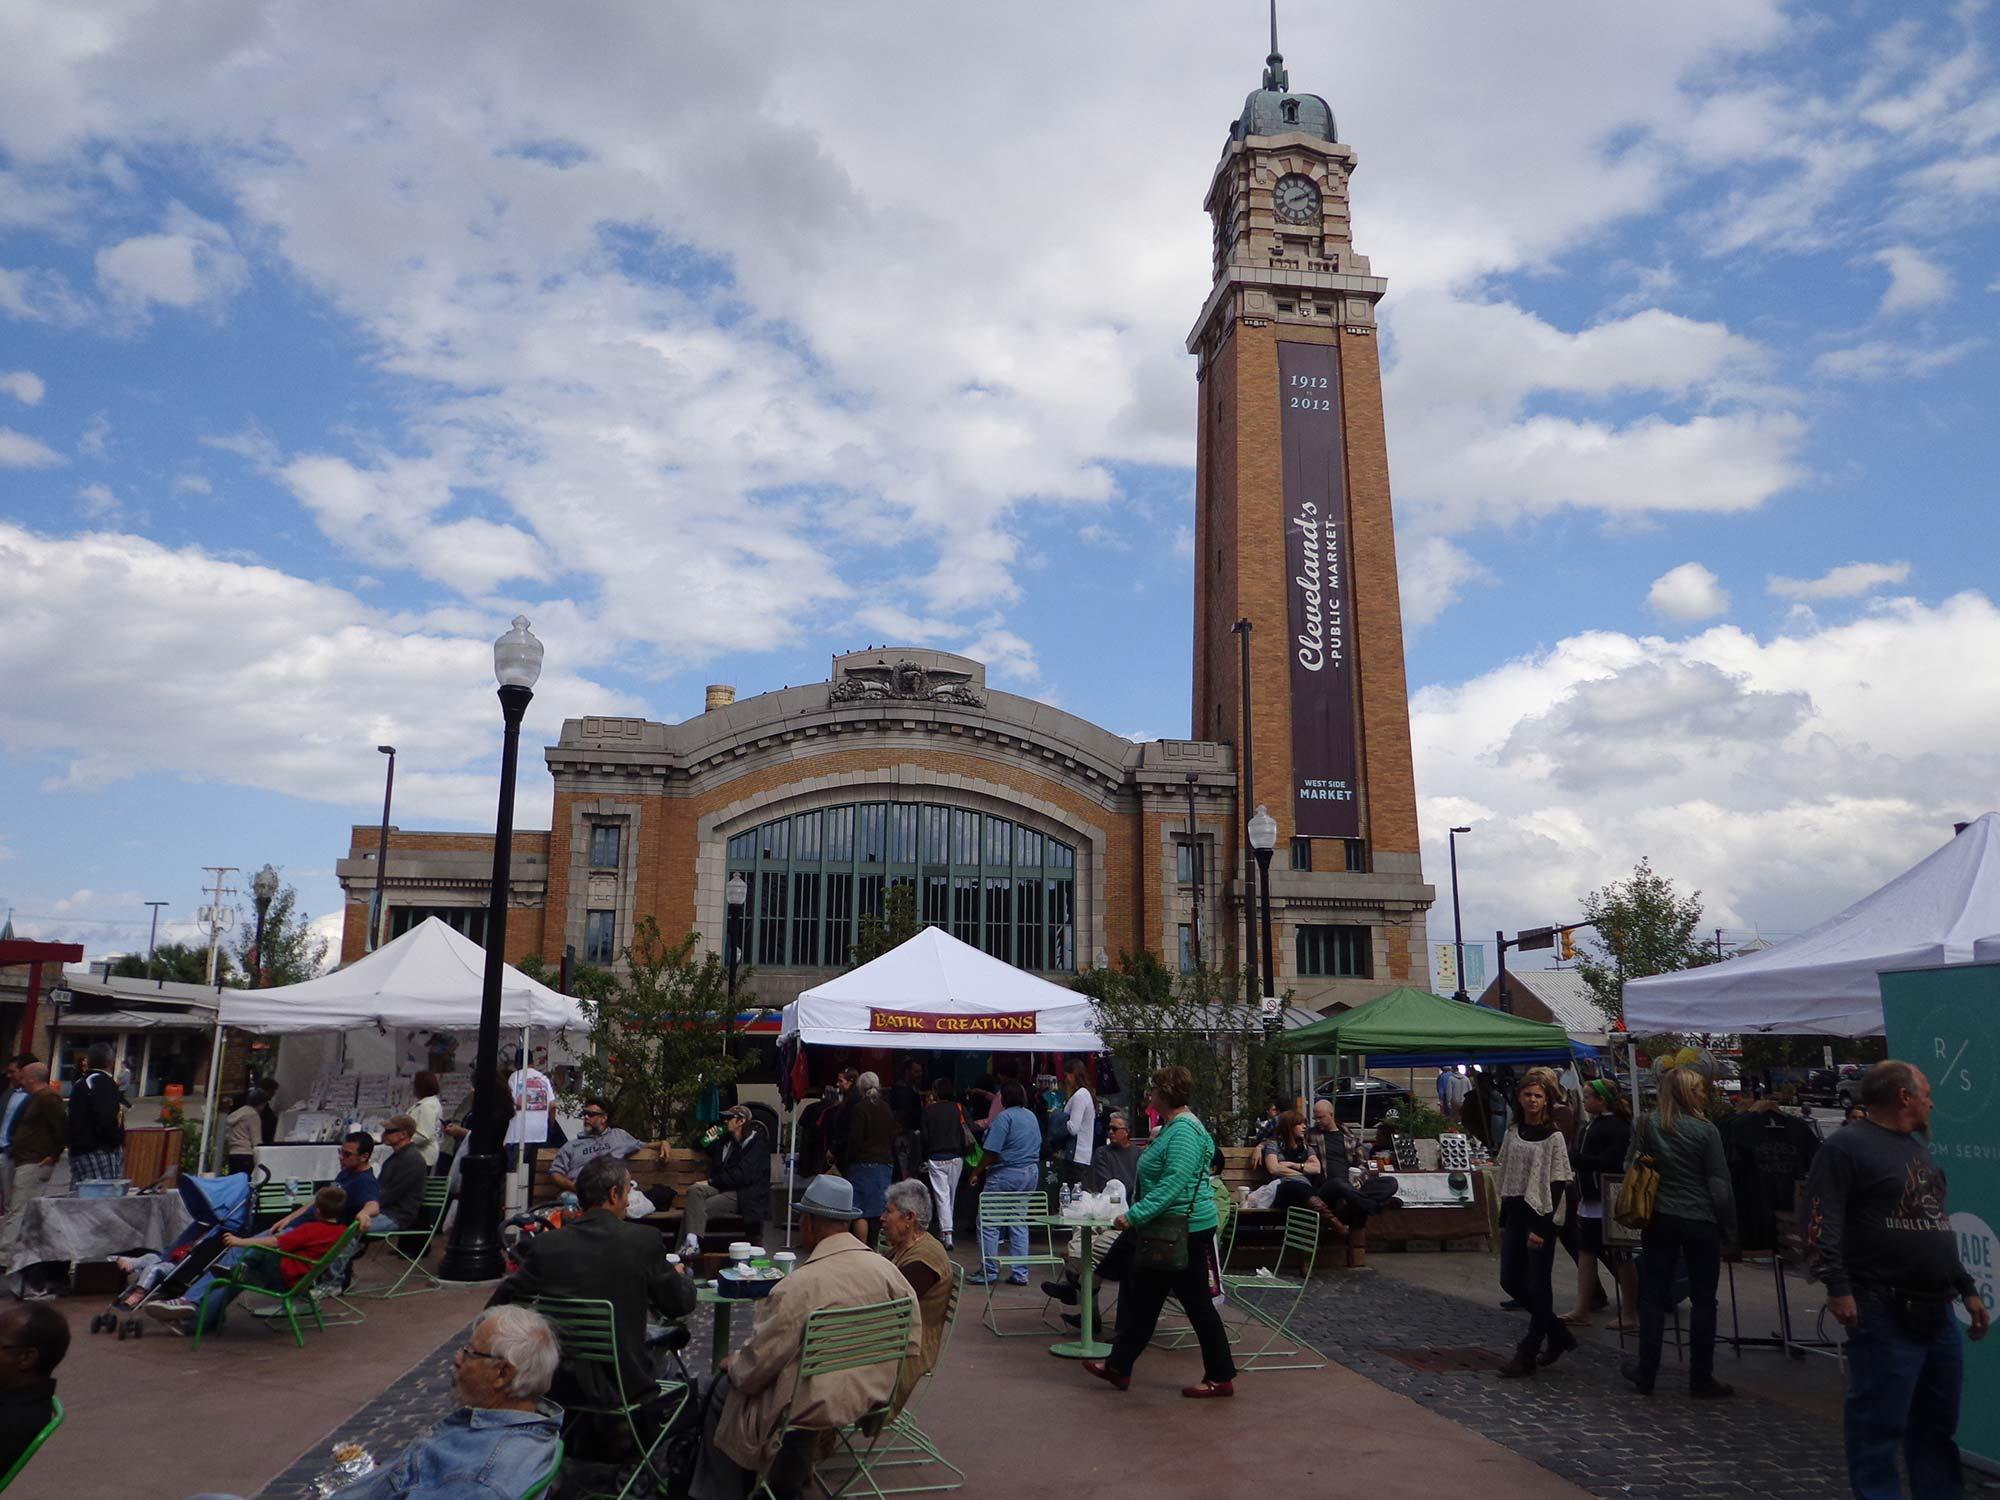 West Side Market and Market District